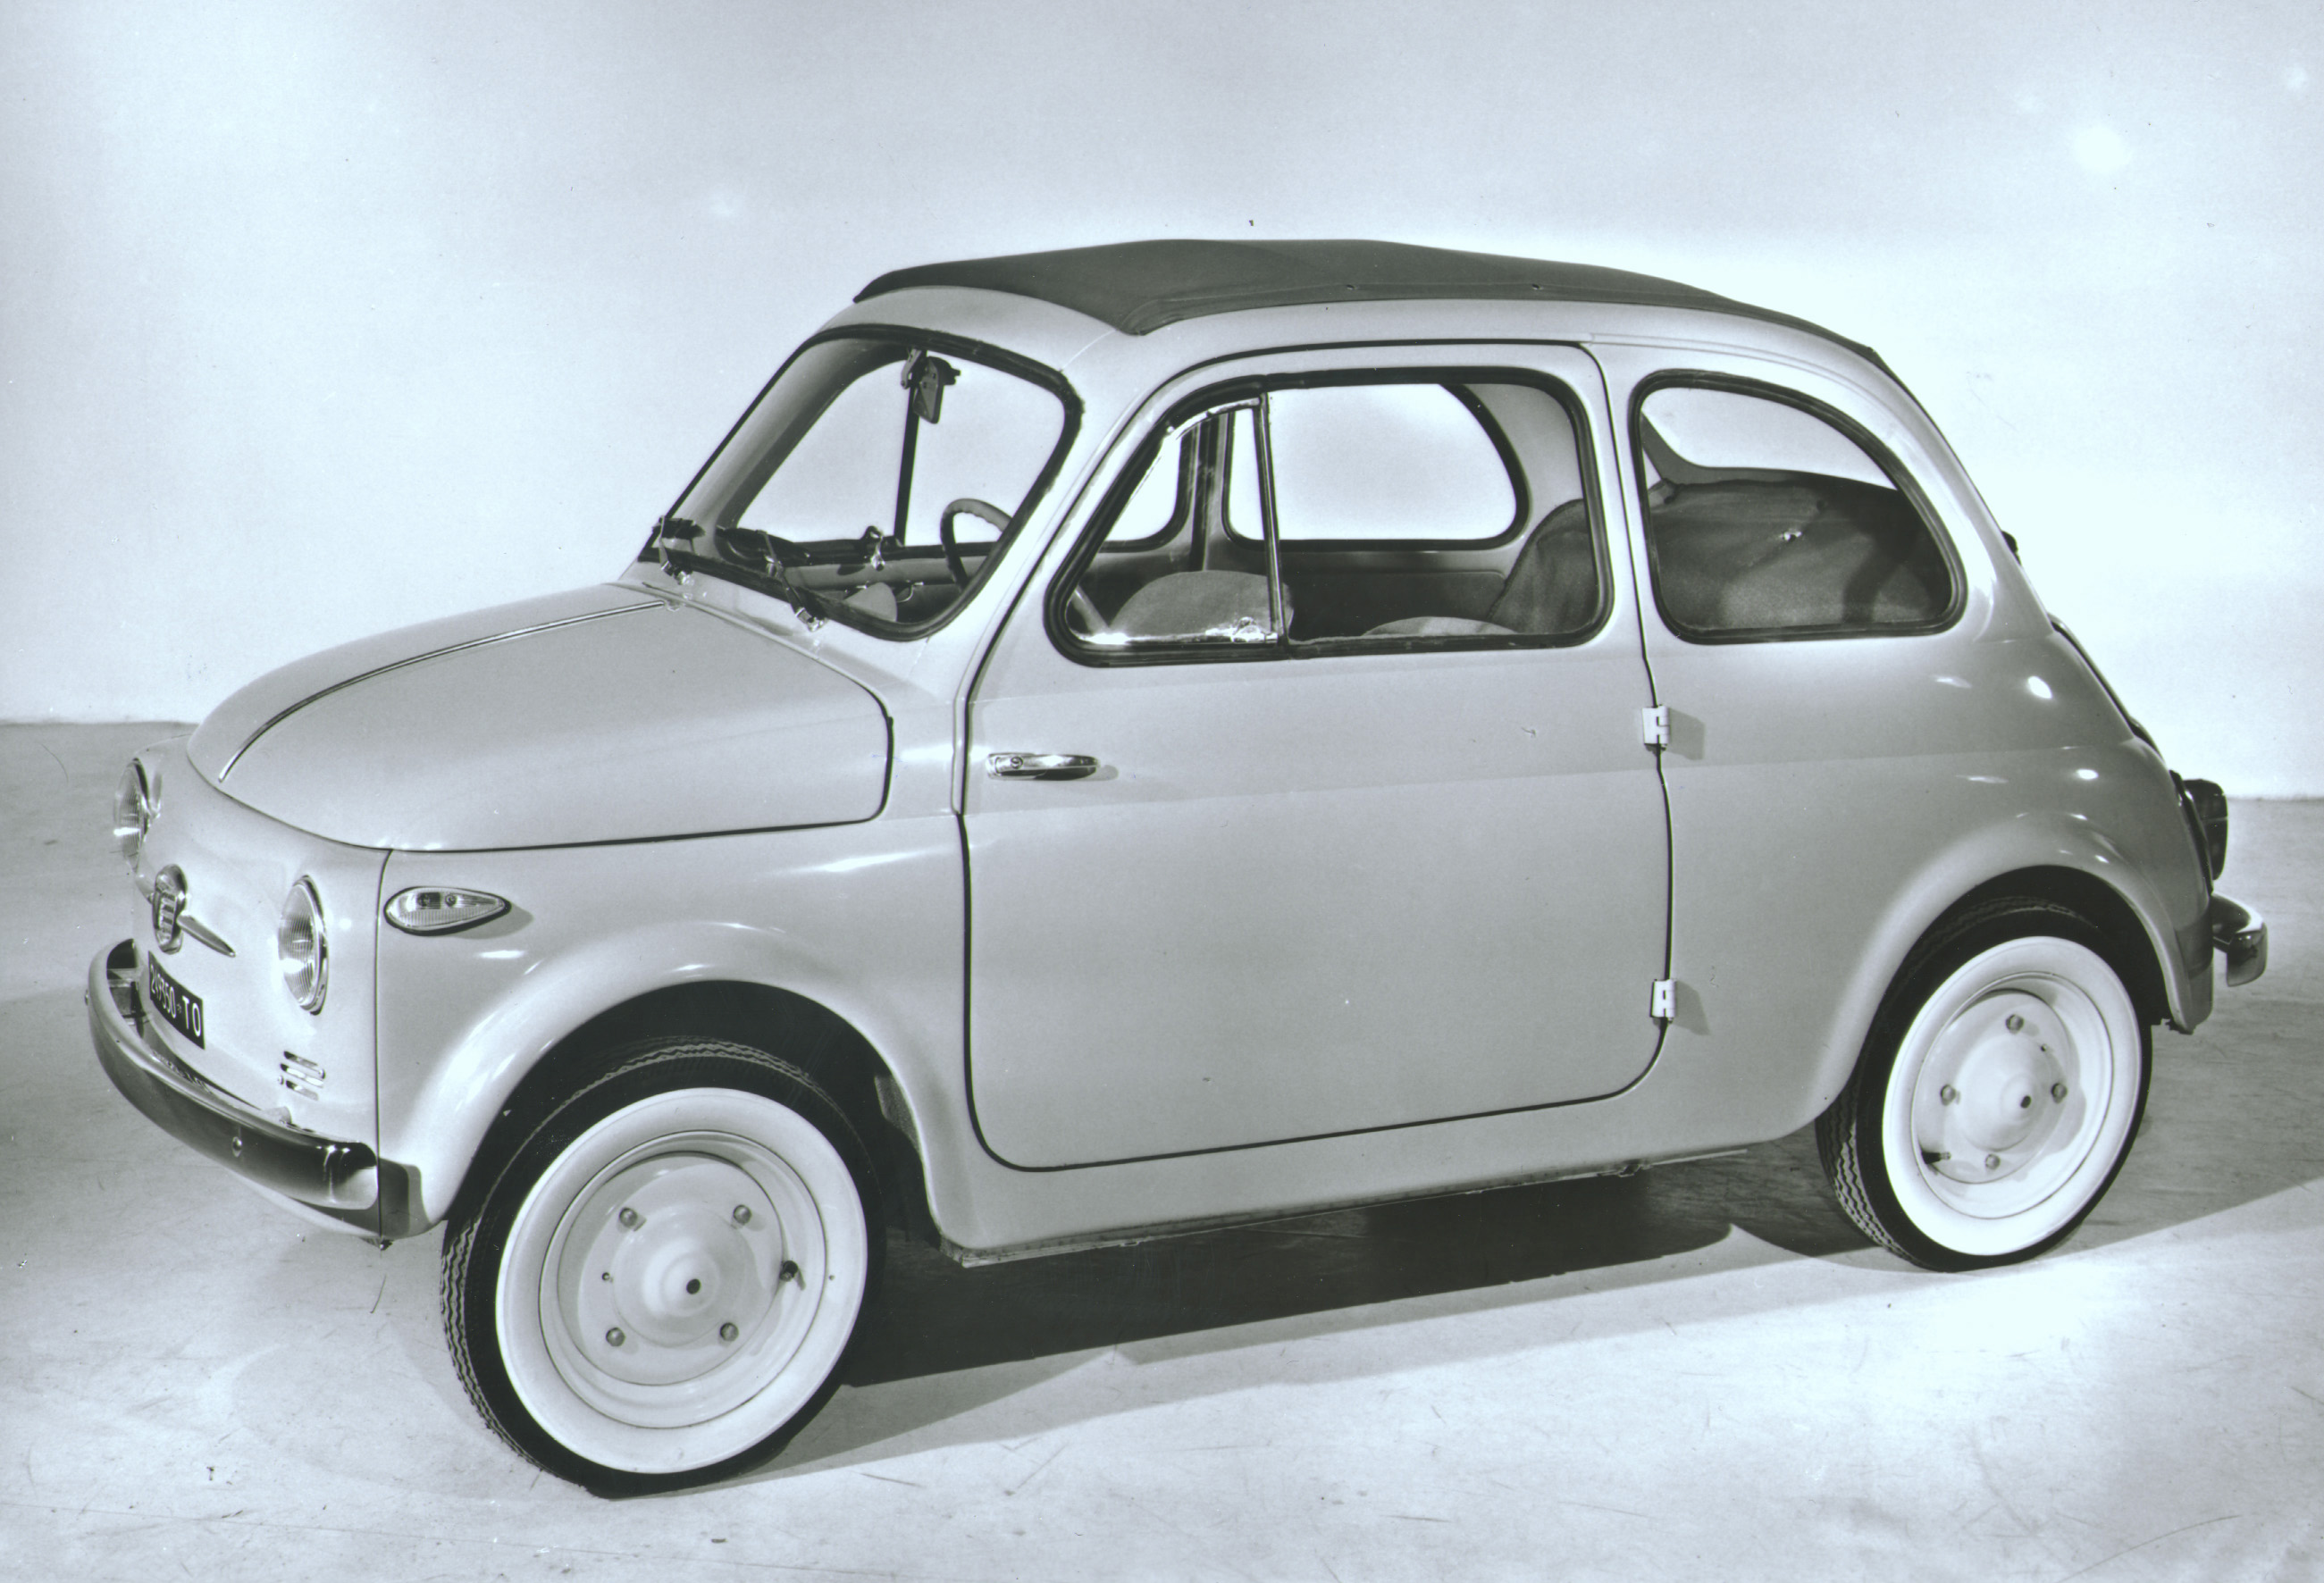 IOW – Italian Old Wheels